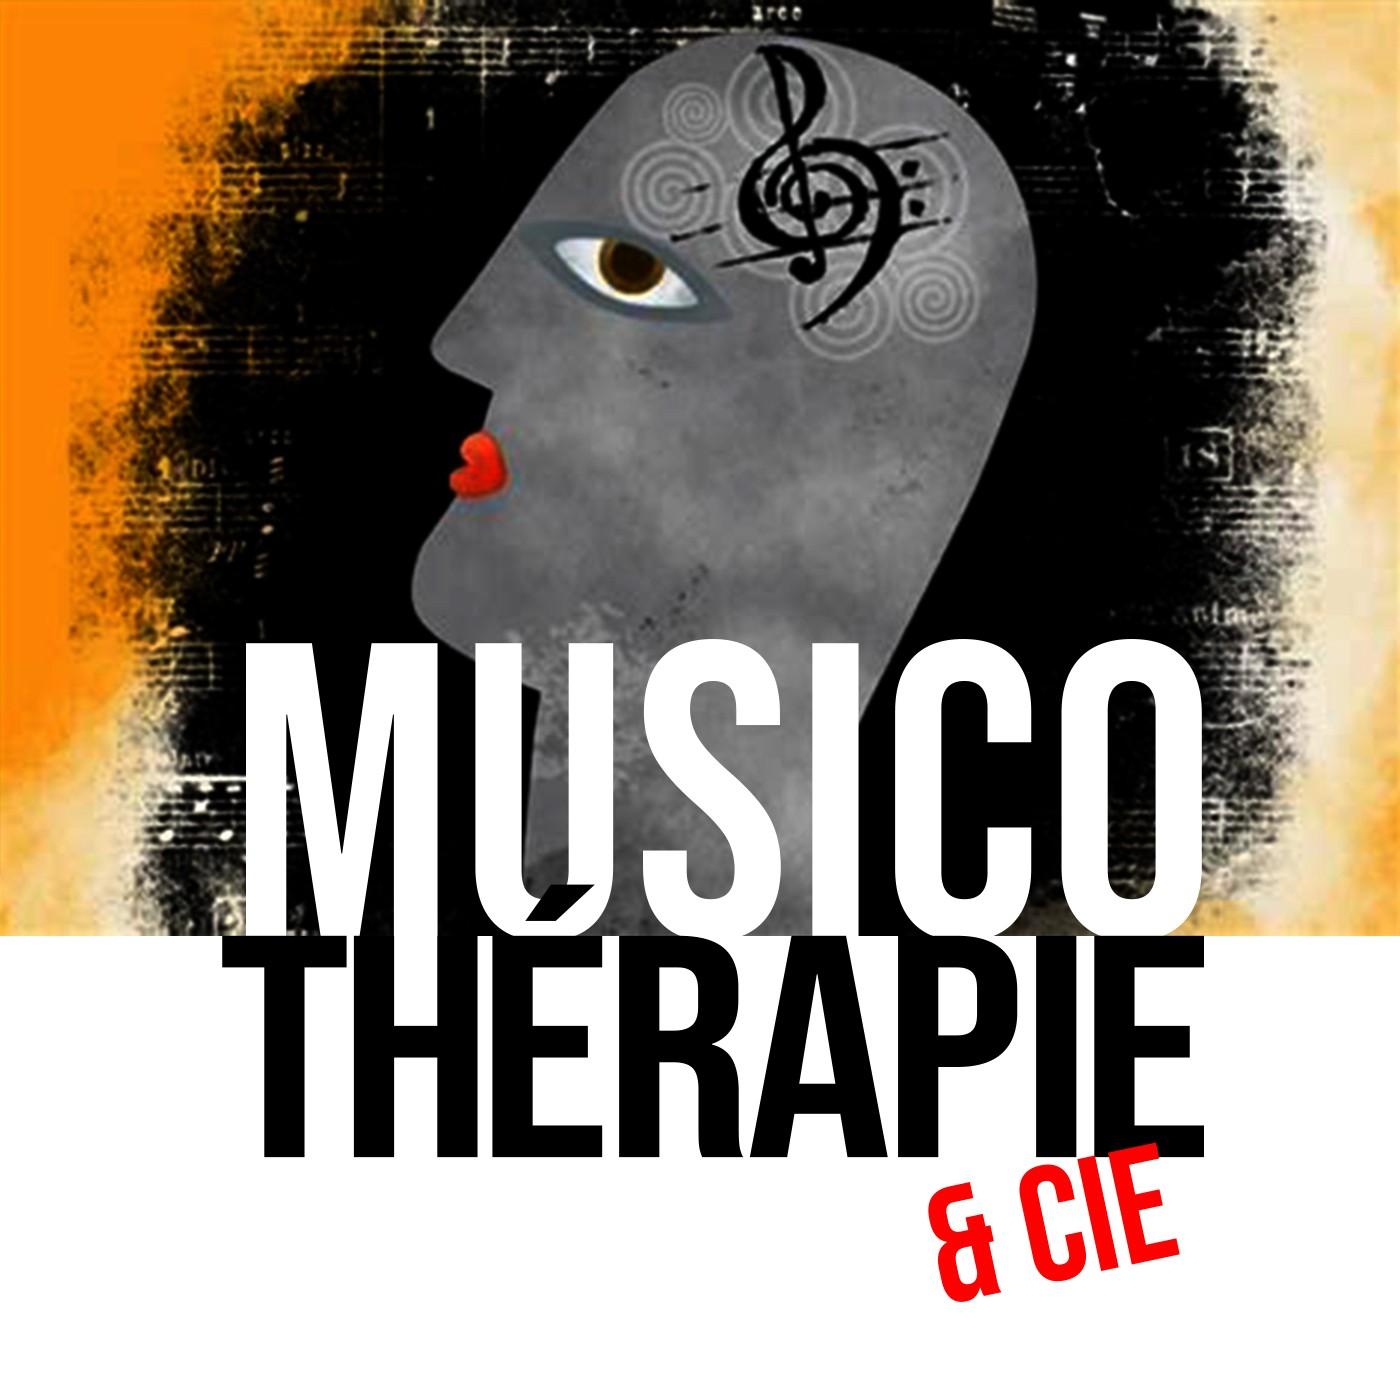 Musicothérapie & Cie